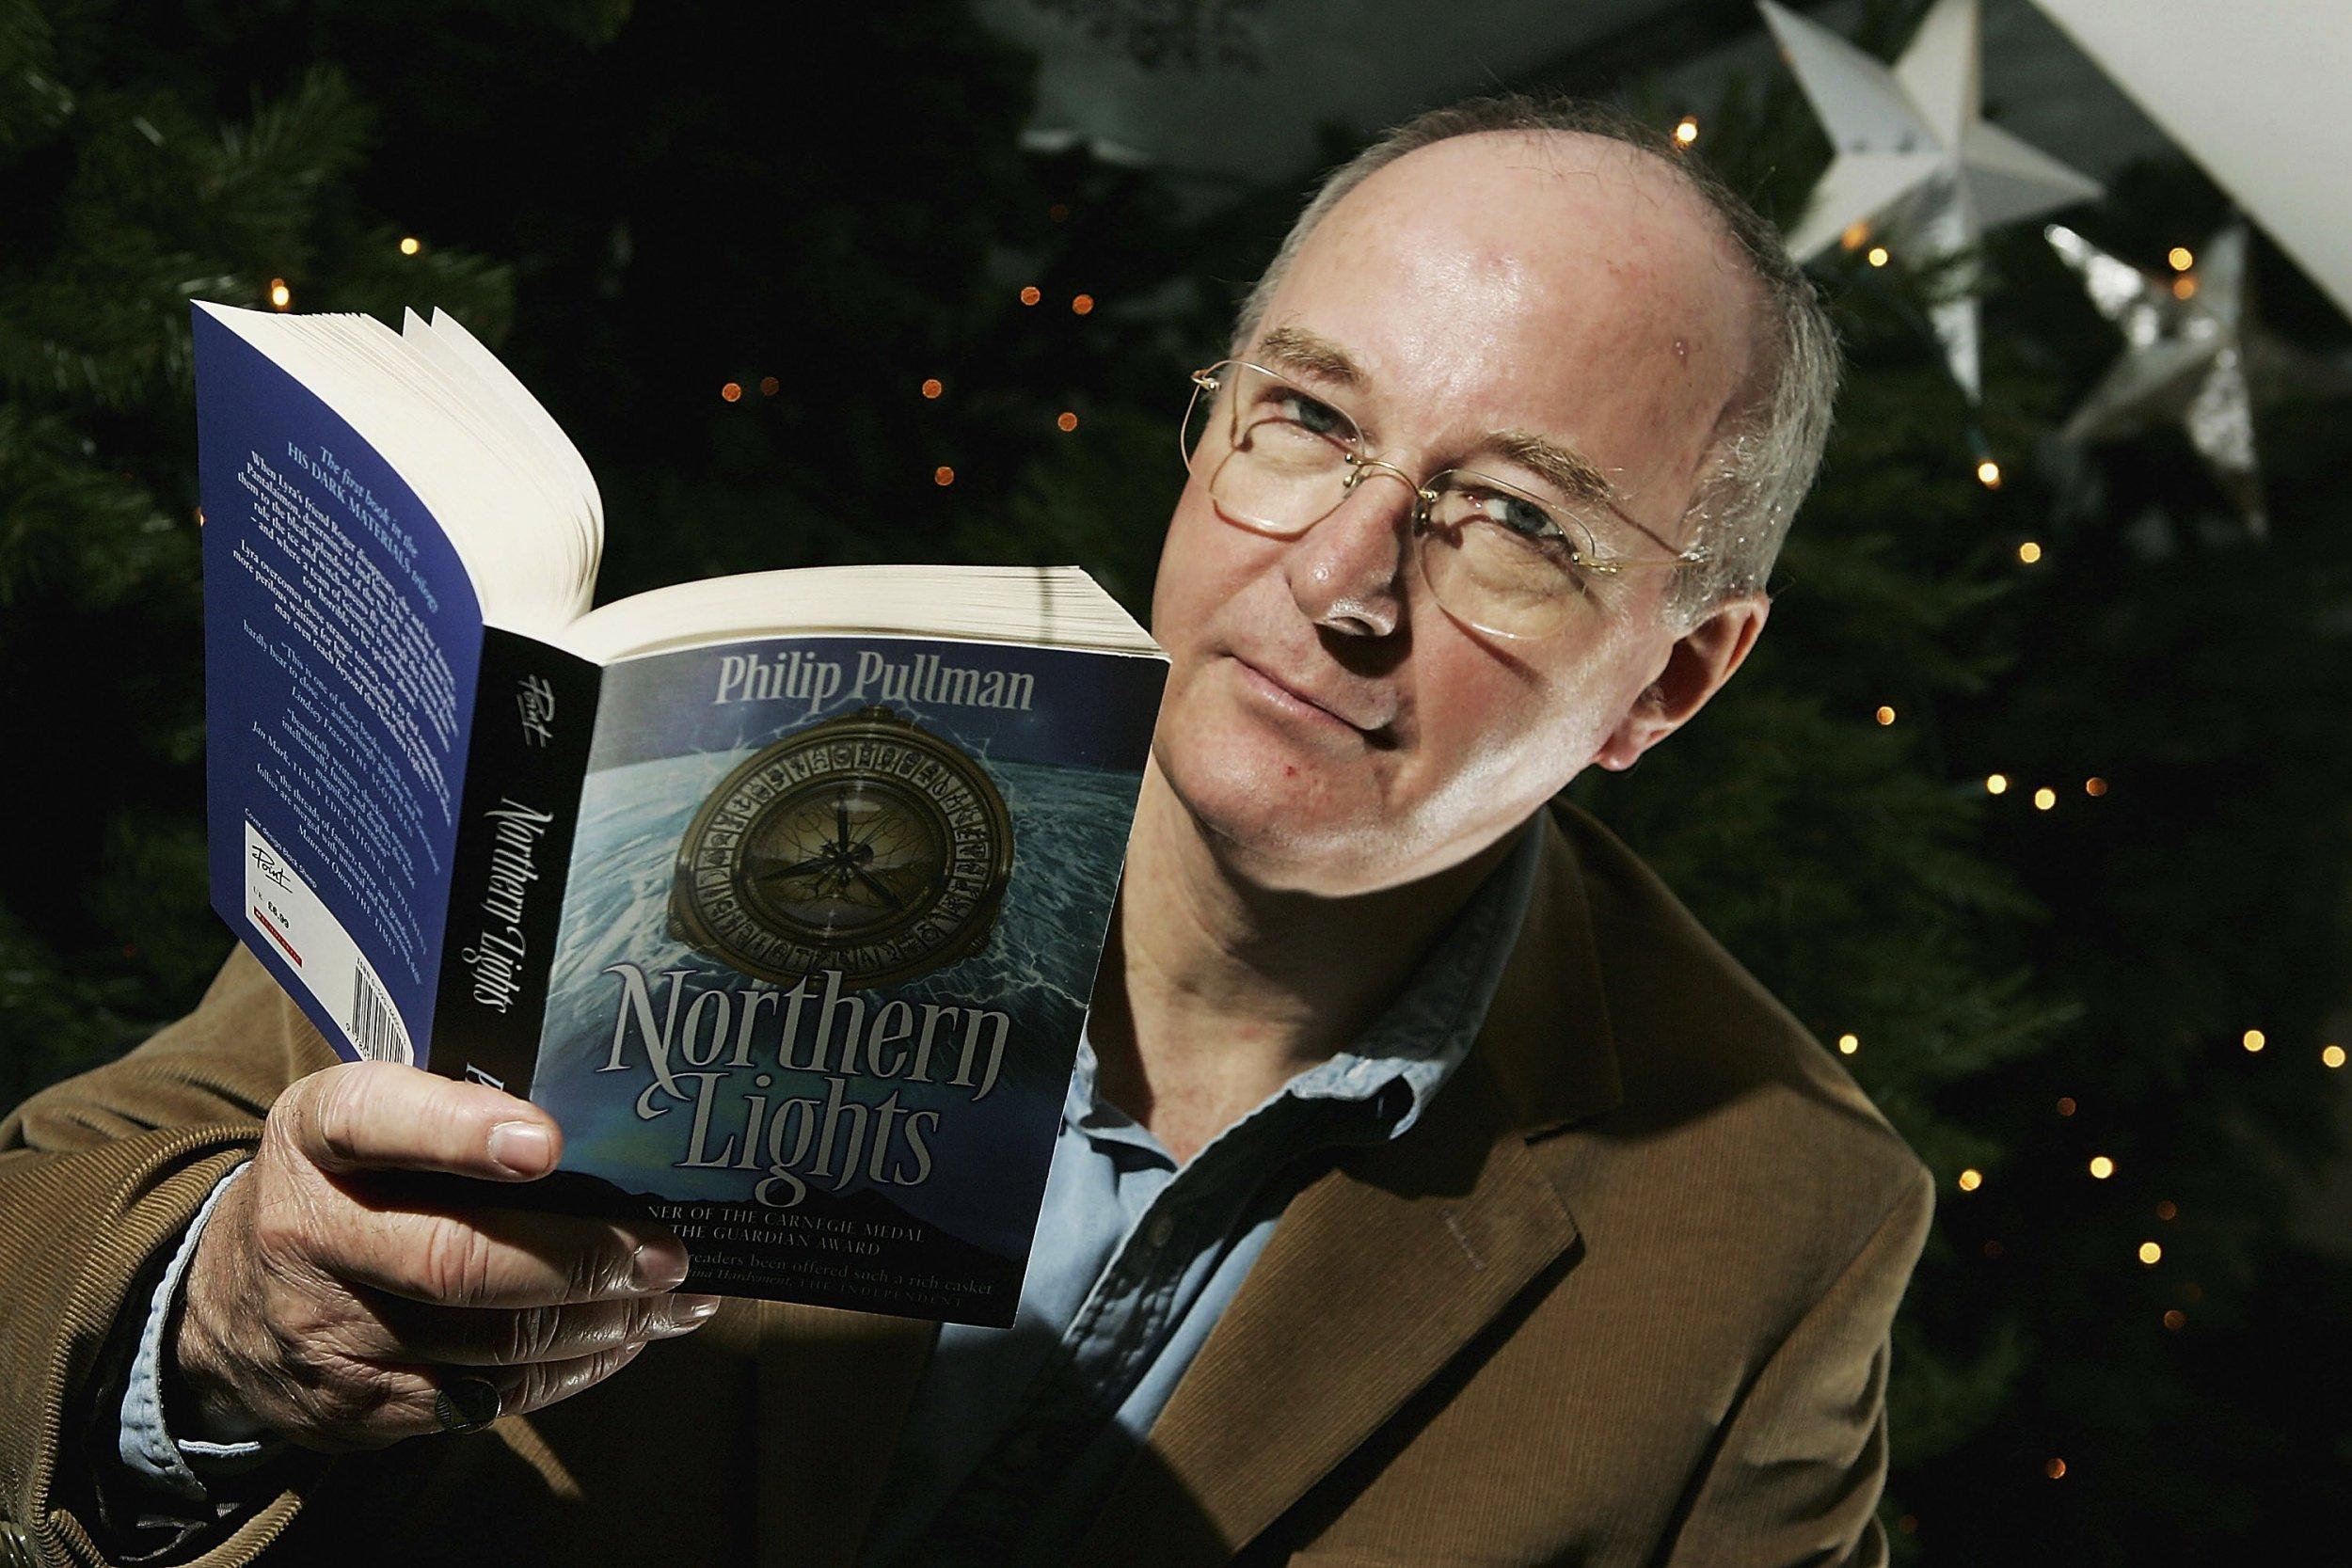 Philip Pullman reads Northern Lights